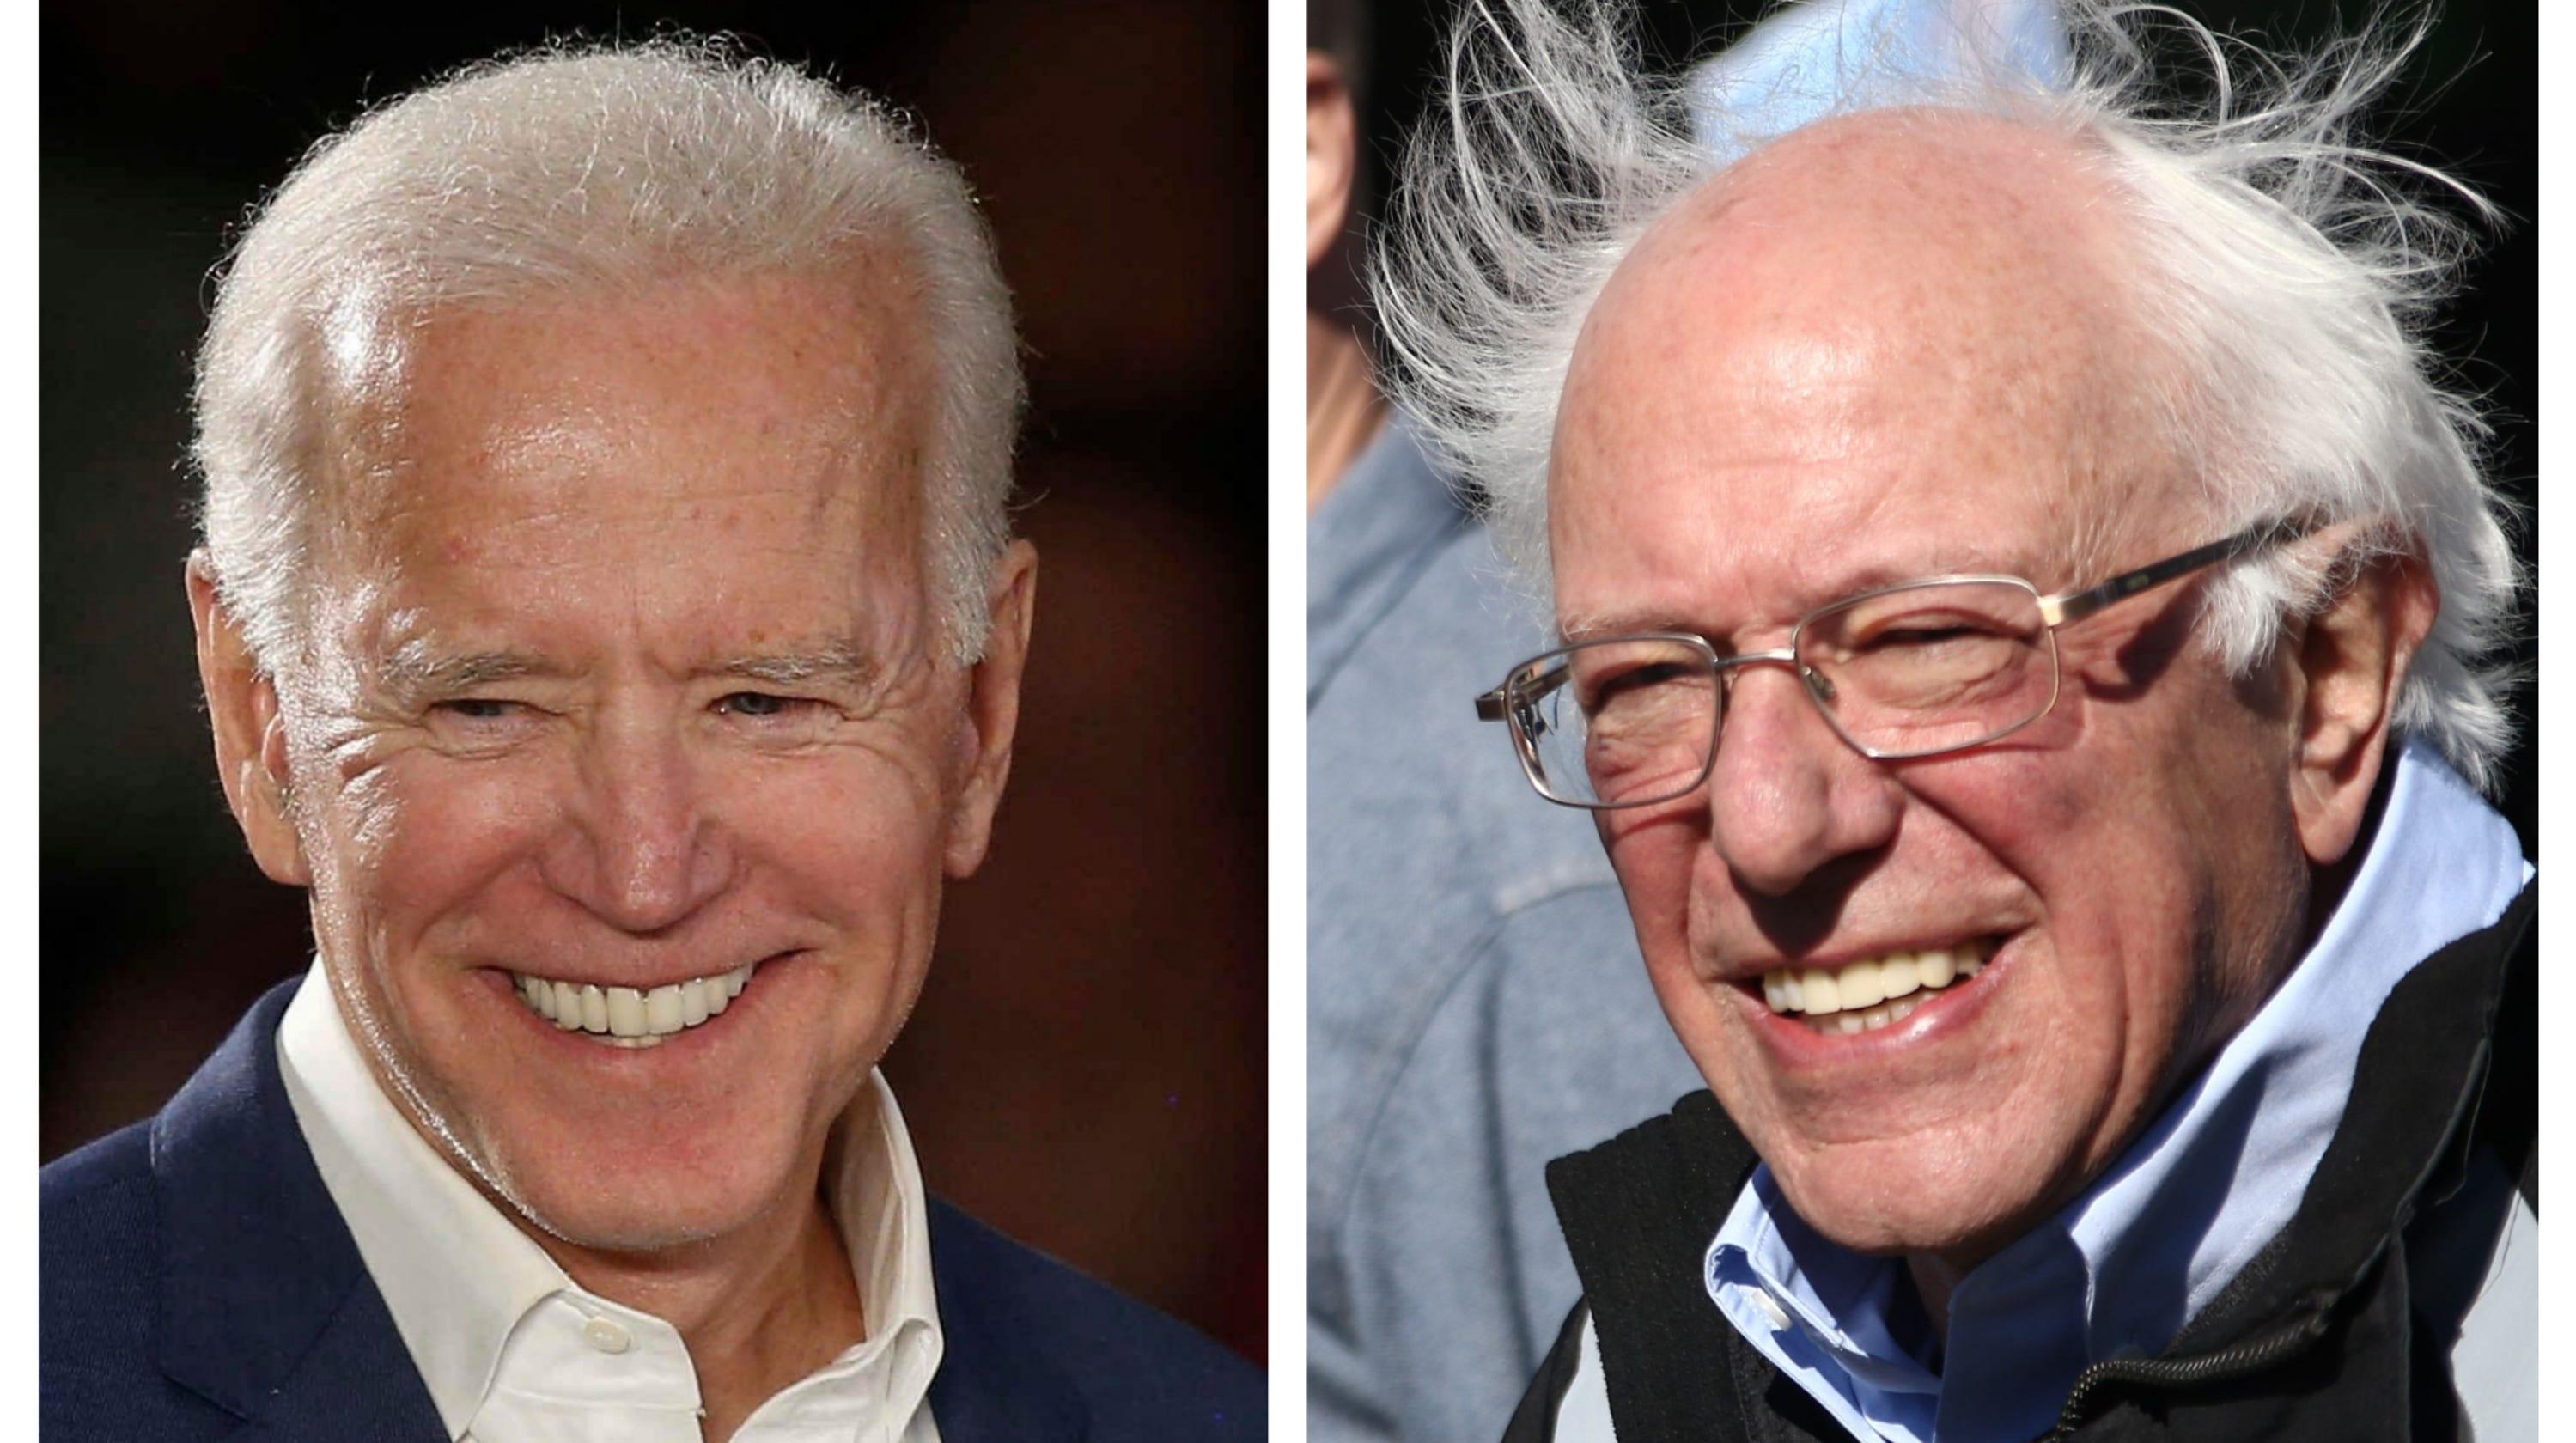 Iowa Poll: Biden, Sanders top early look at possible 2020